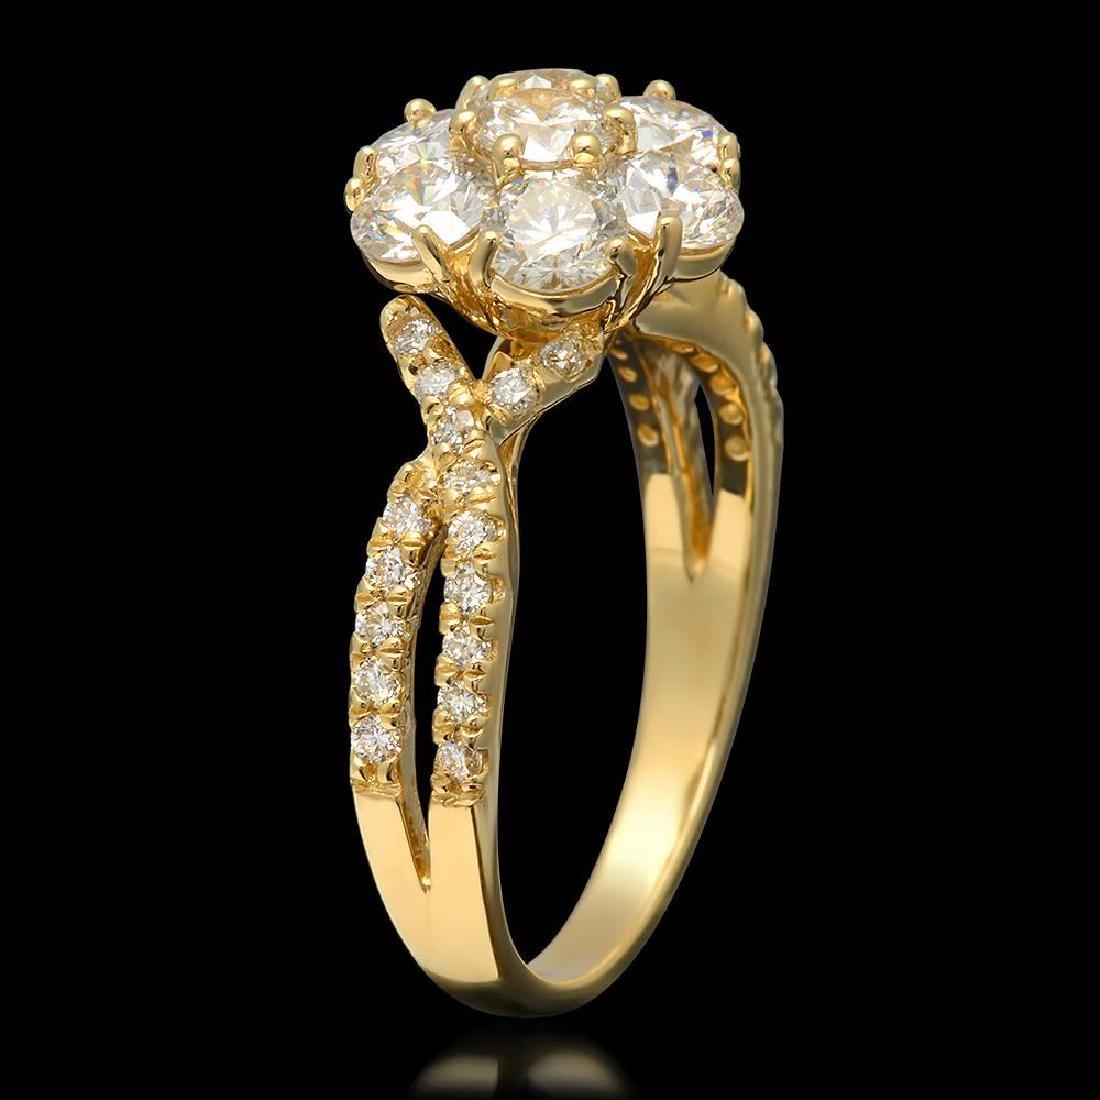 14k Yellow Gold 1.90ct Diamond Ring - 2